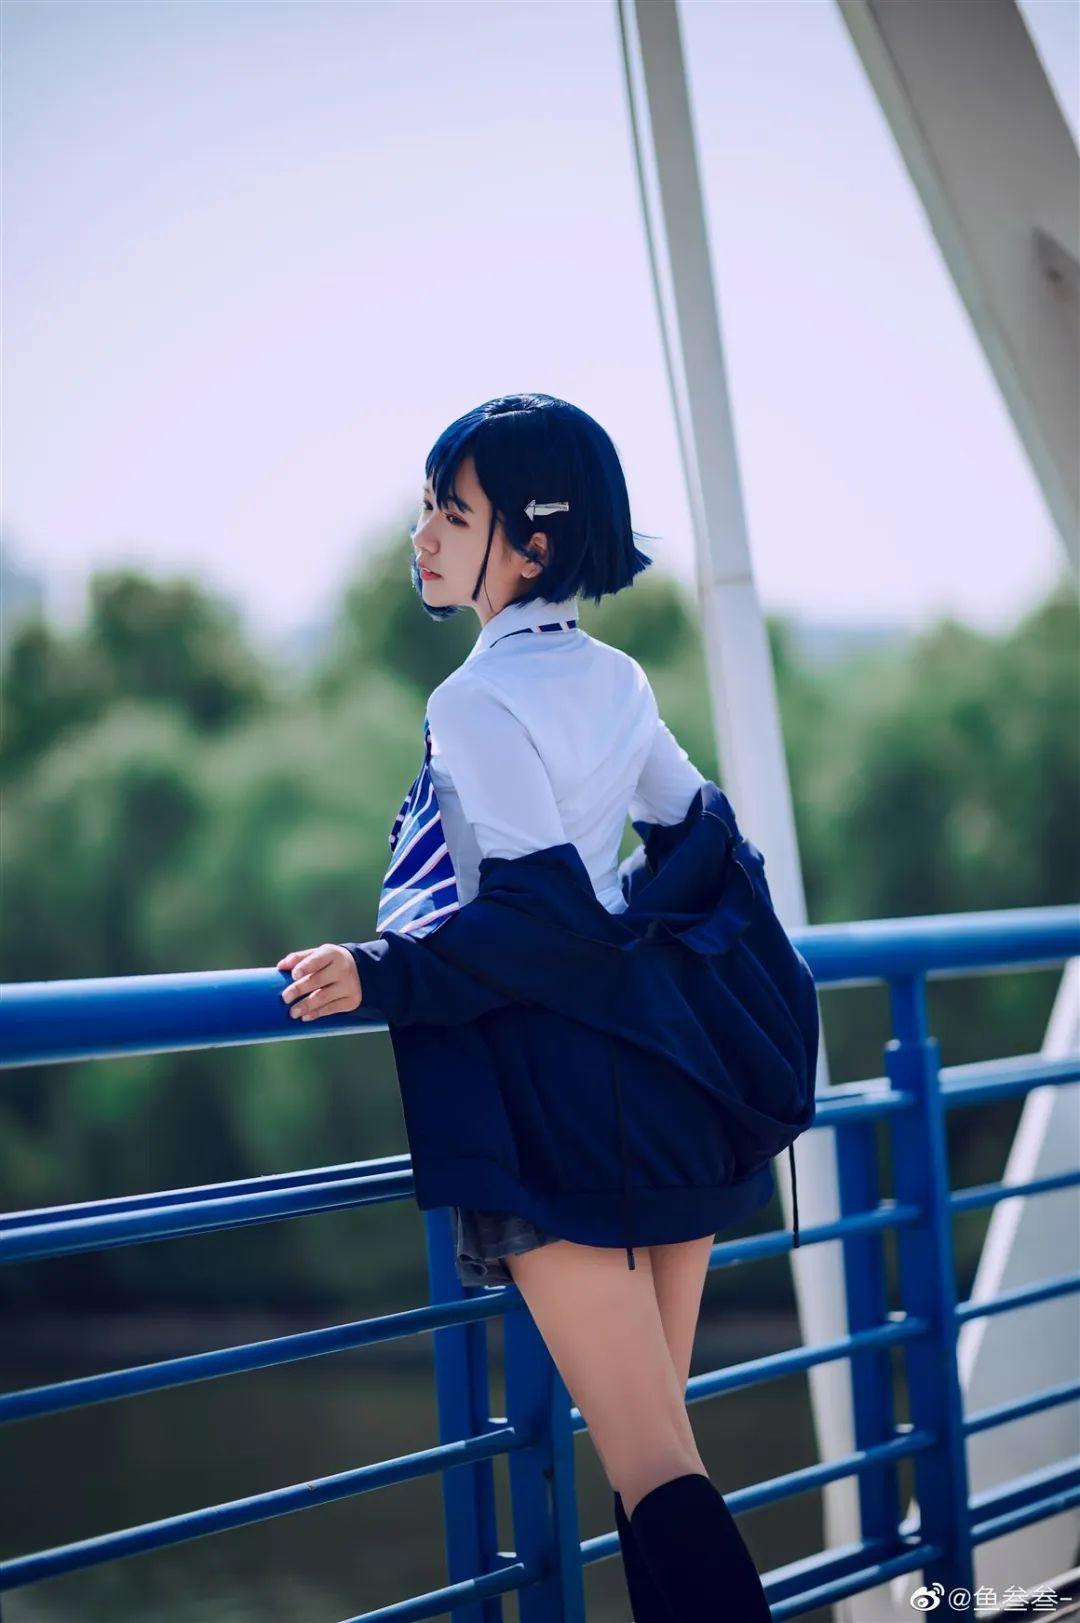 Cosplay-《darlinginthefranxx》莓(015)@鱼叁叁-,jk制服真耐看_图片 No.7